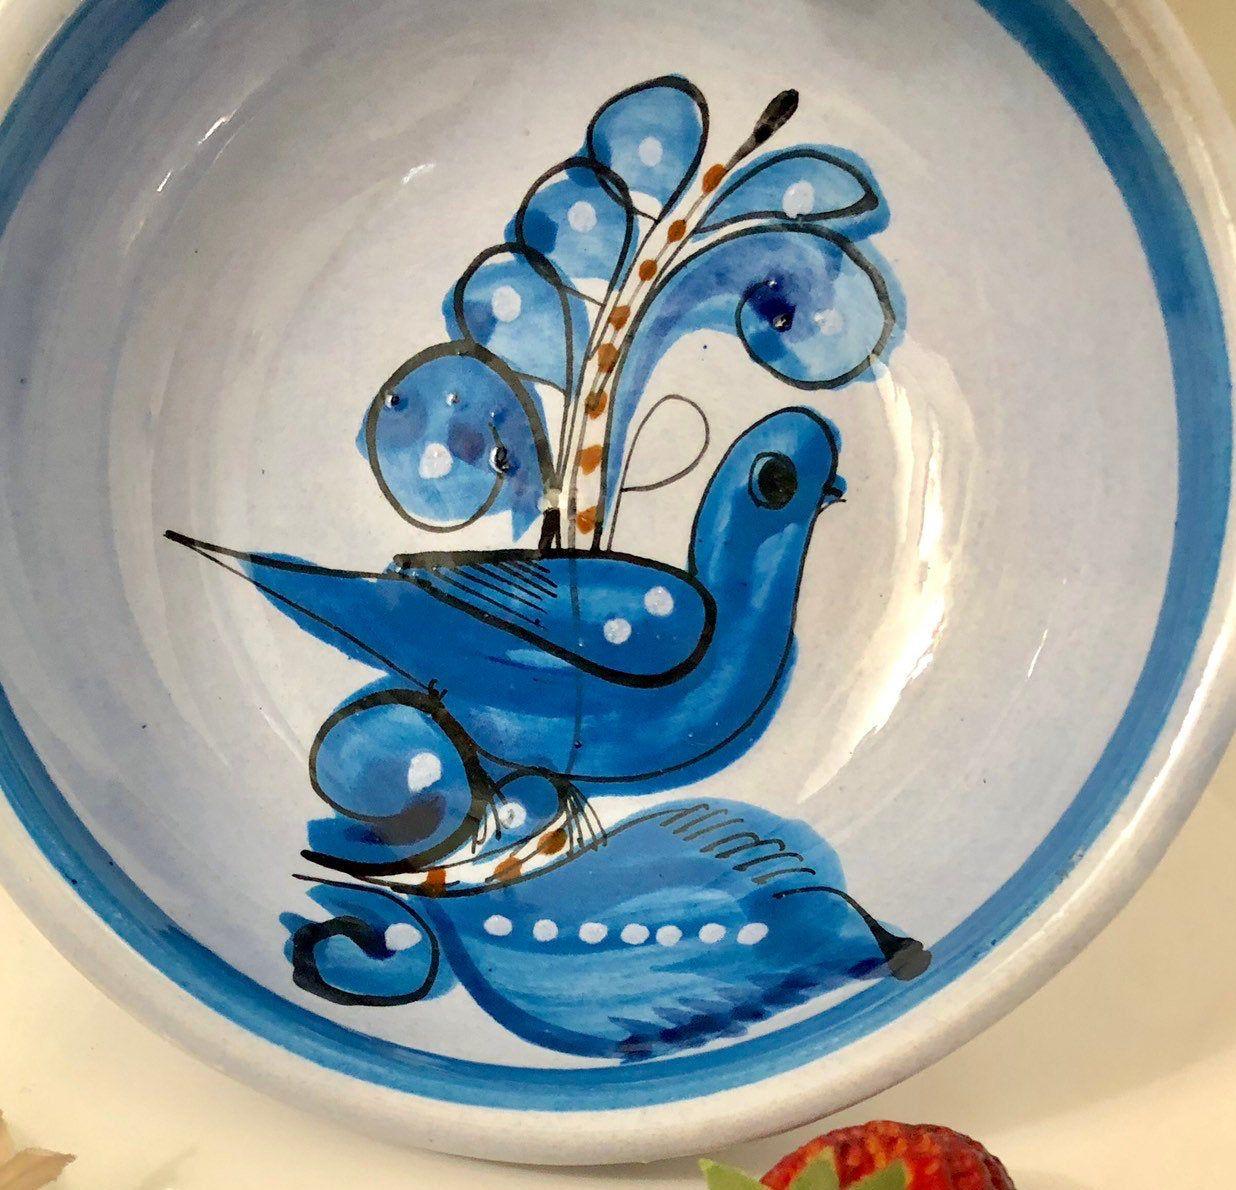 Striped Vase Blue Ceramic Vintage Distressed Handmade Pottery